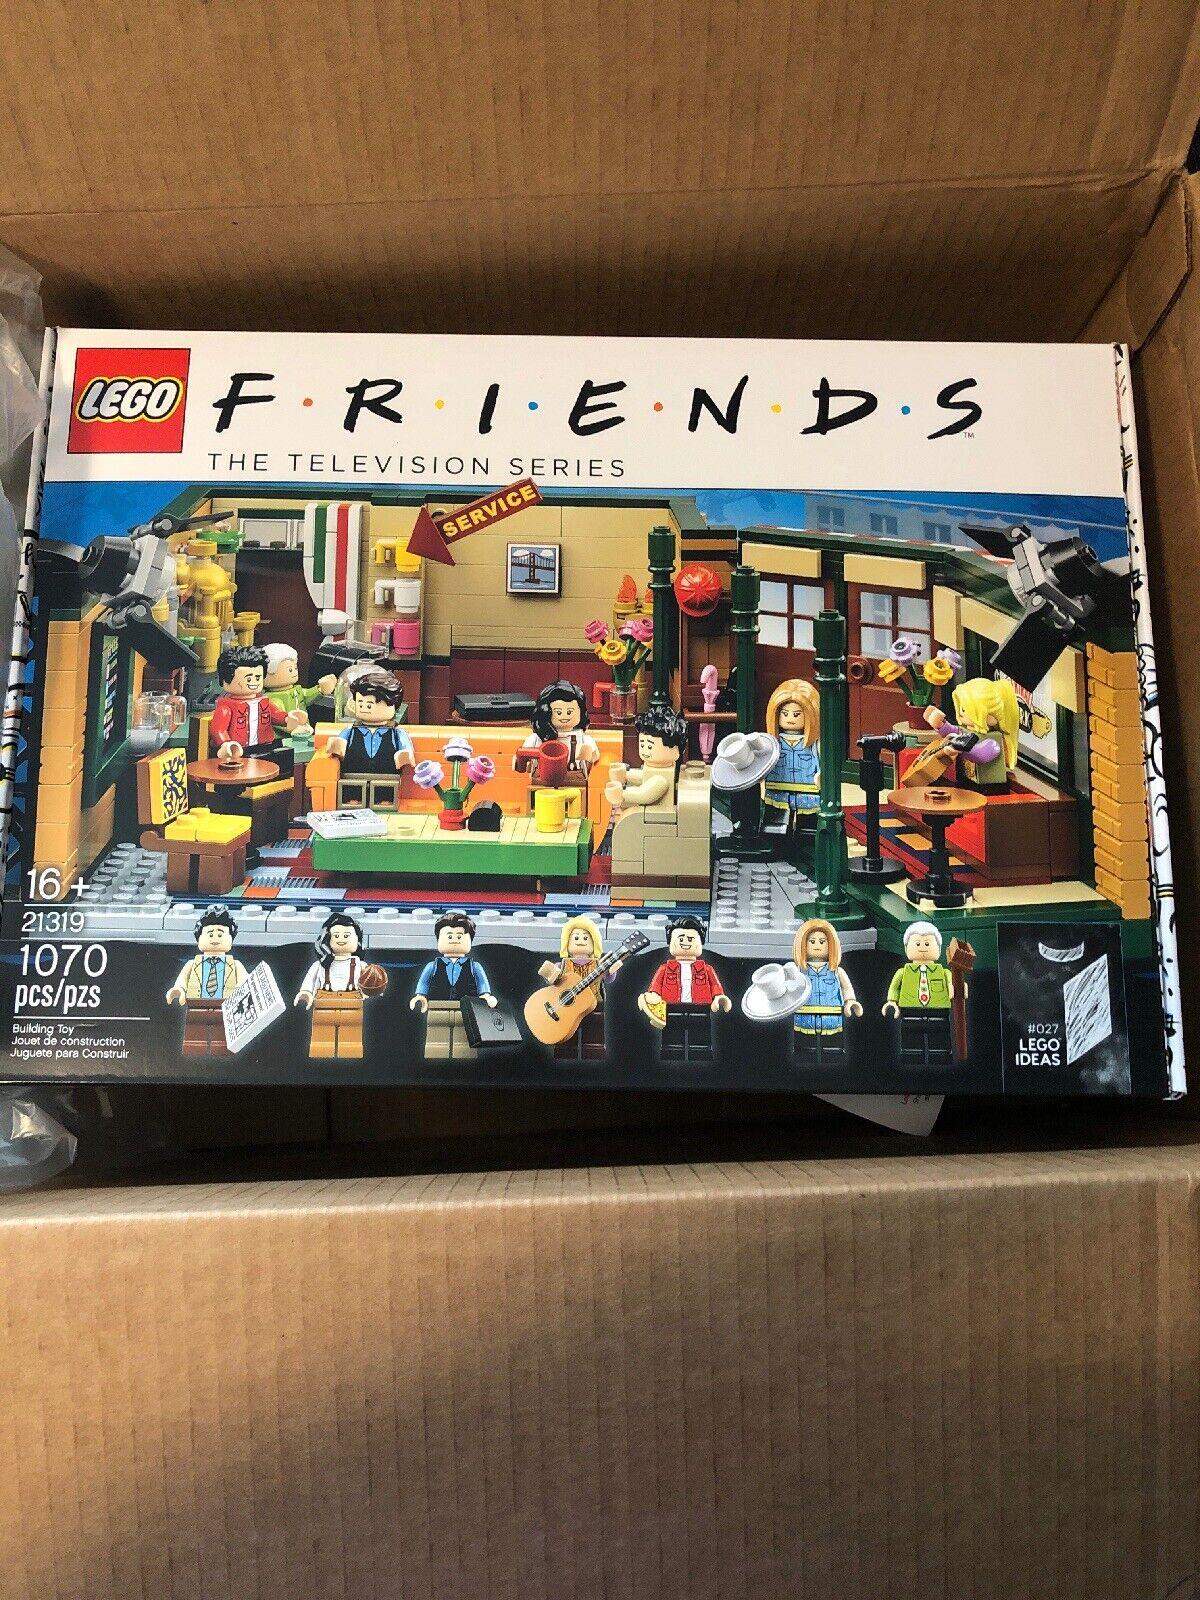 Lego freunde Central Perk 21319 Brand New IN HAND